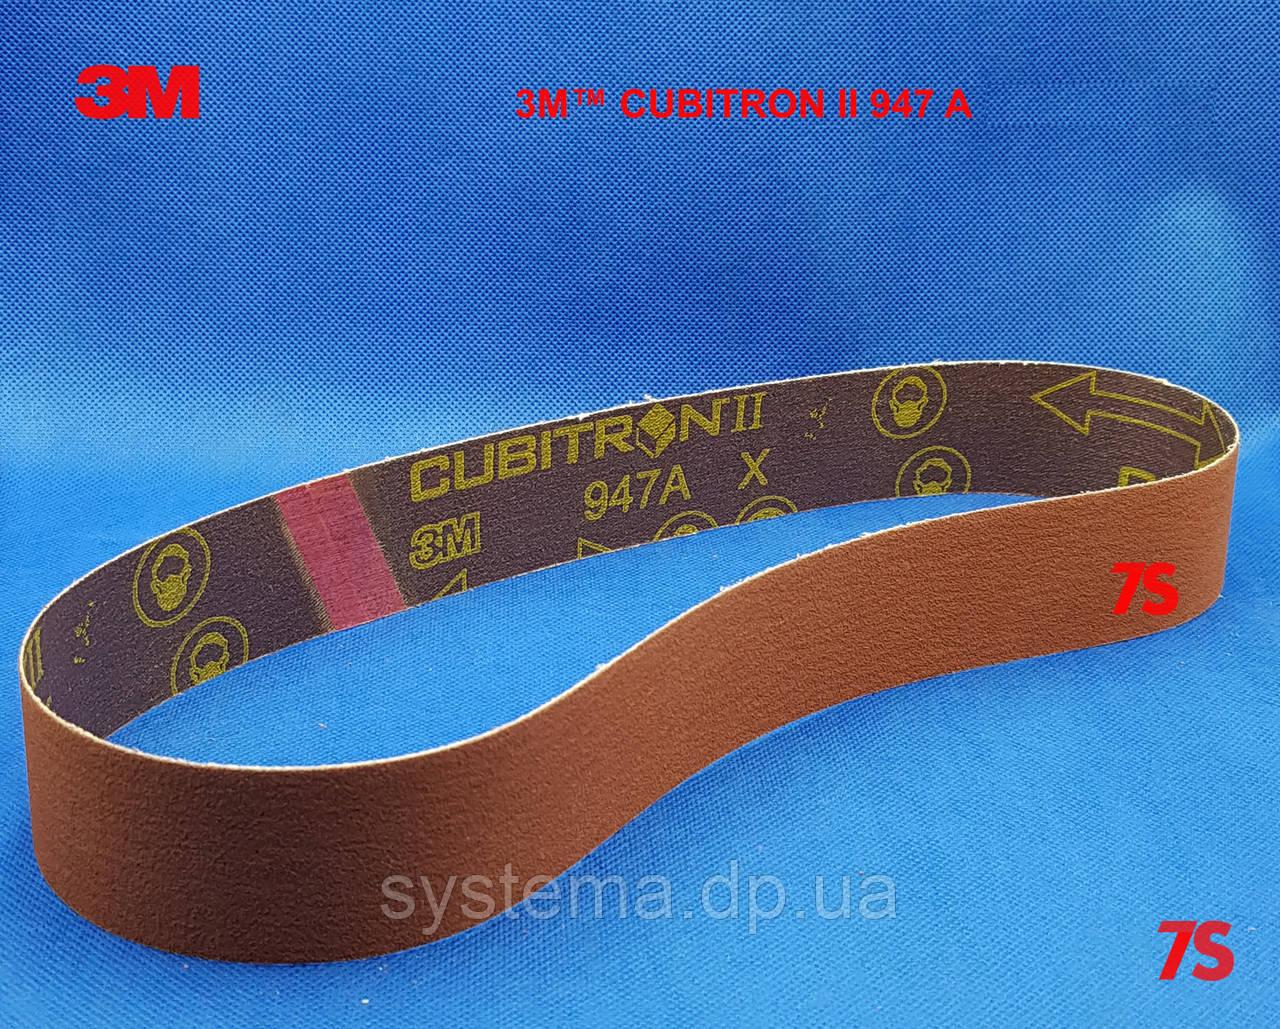 3M™ Cubitron™ II 947A - Шліфувальна стрічка 50x1500 мм, P120+